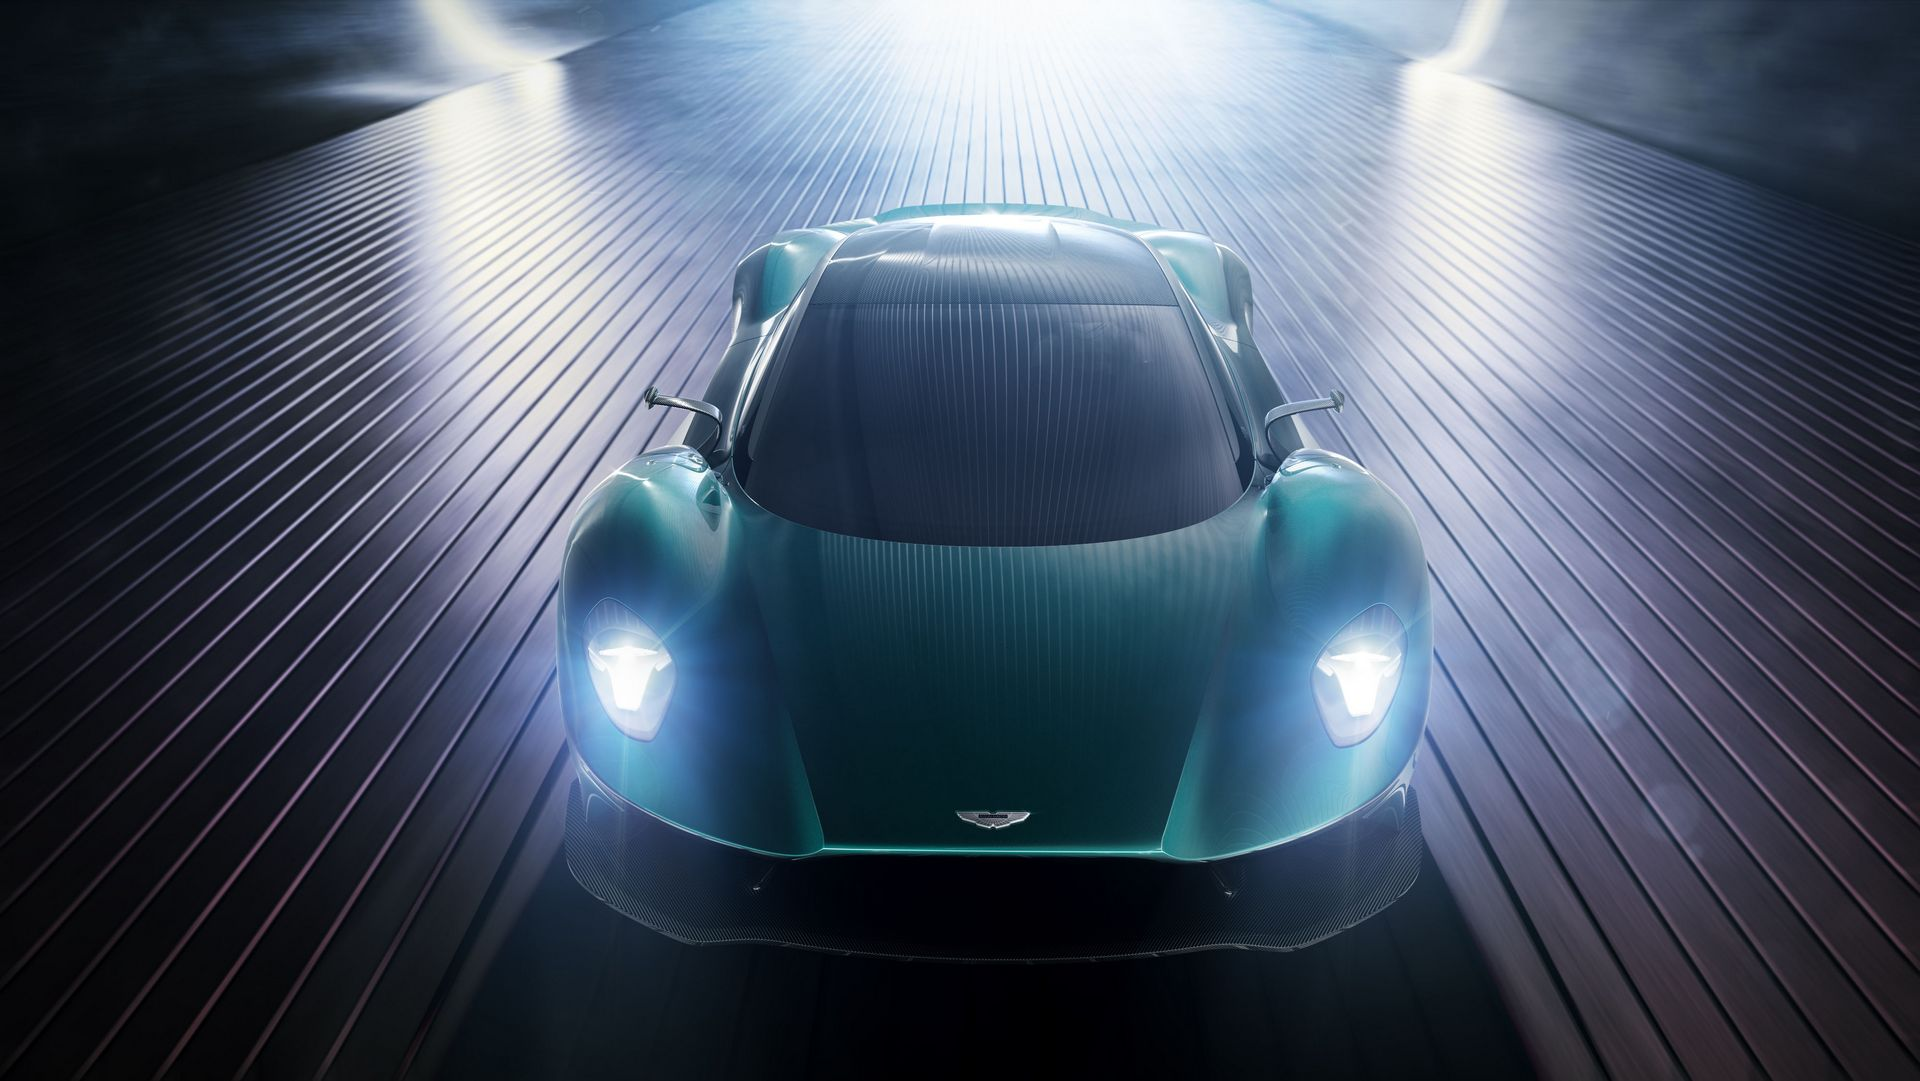 Aston Martin Vanquish Vision Concept (3)